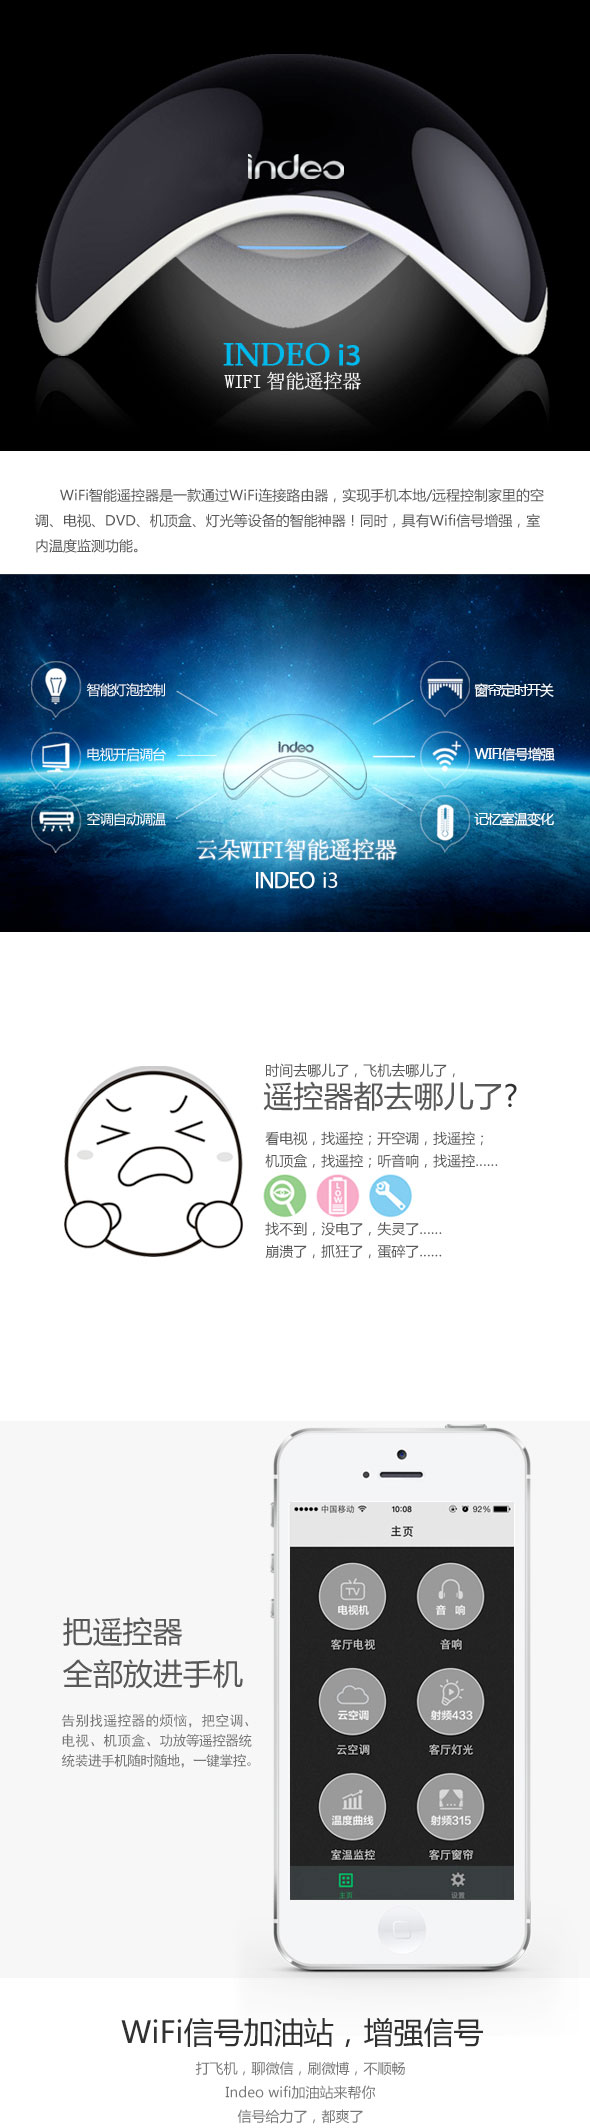 Indeo 云朵i3 WiFi智能遥控器